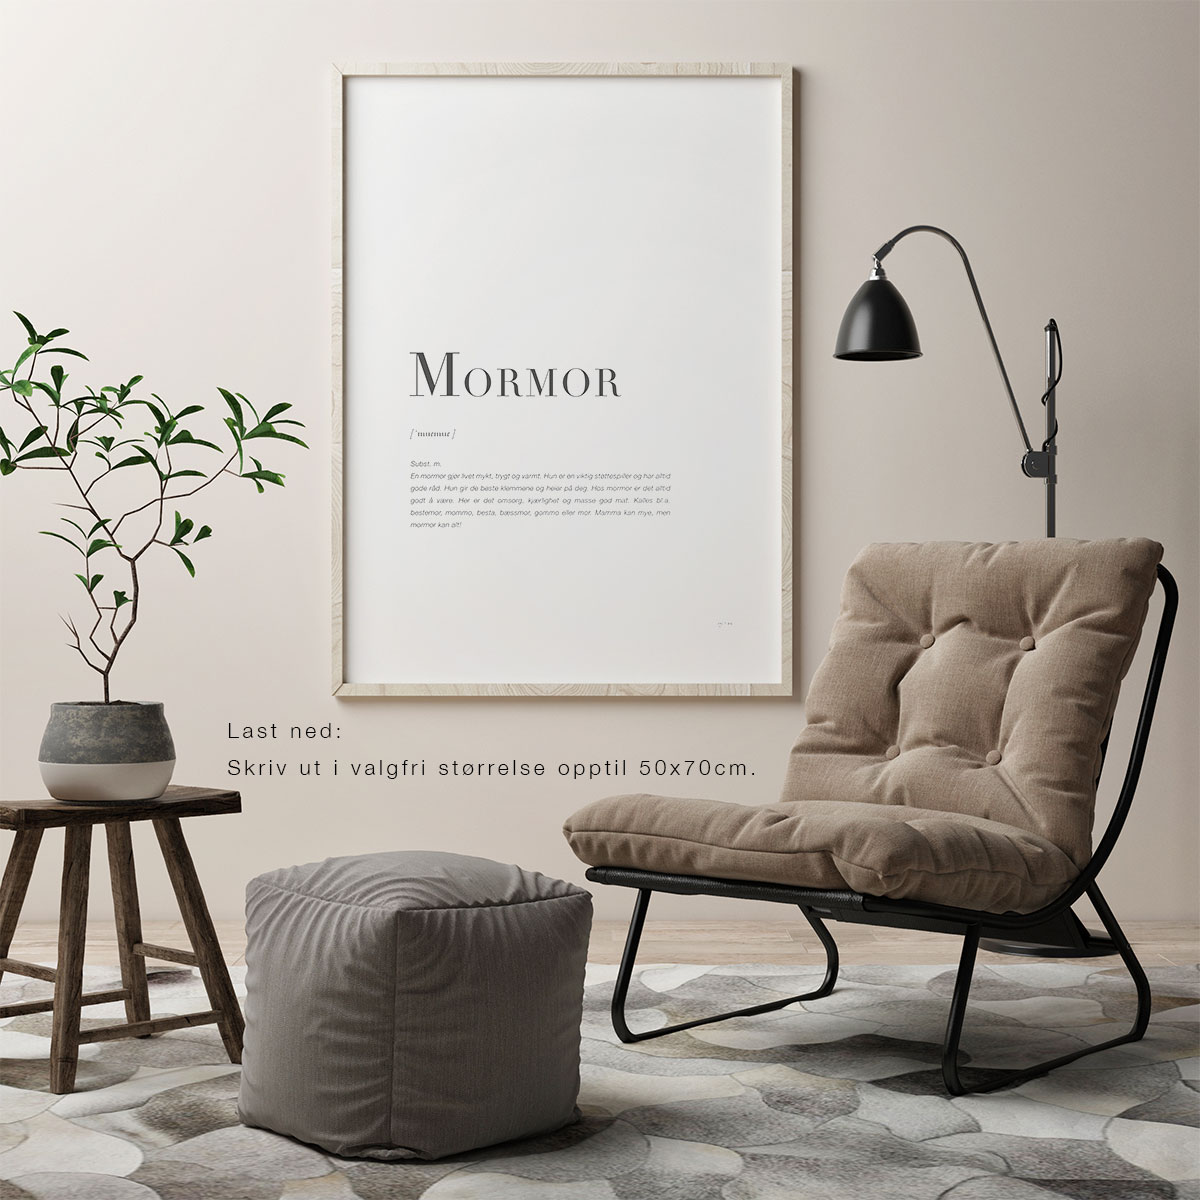 MORMOR-Last ned